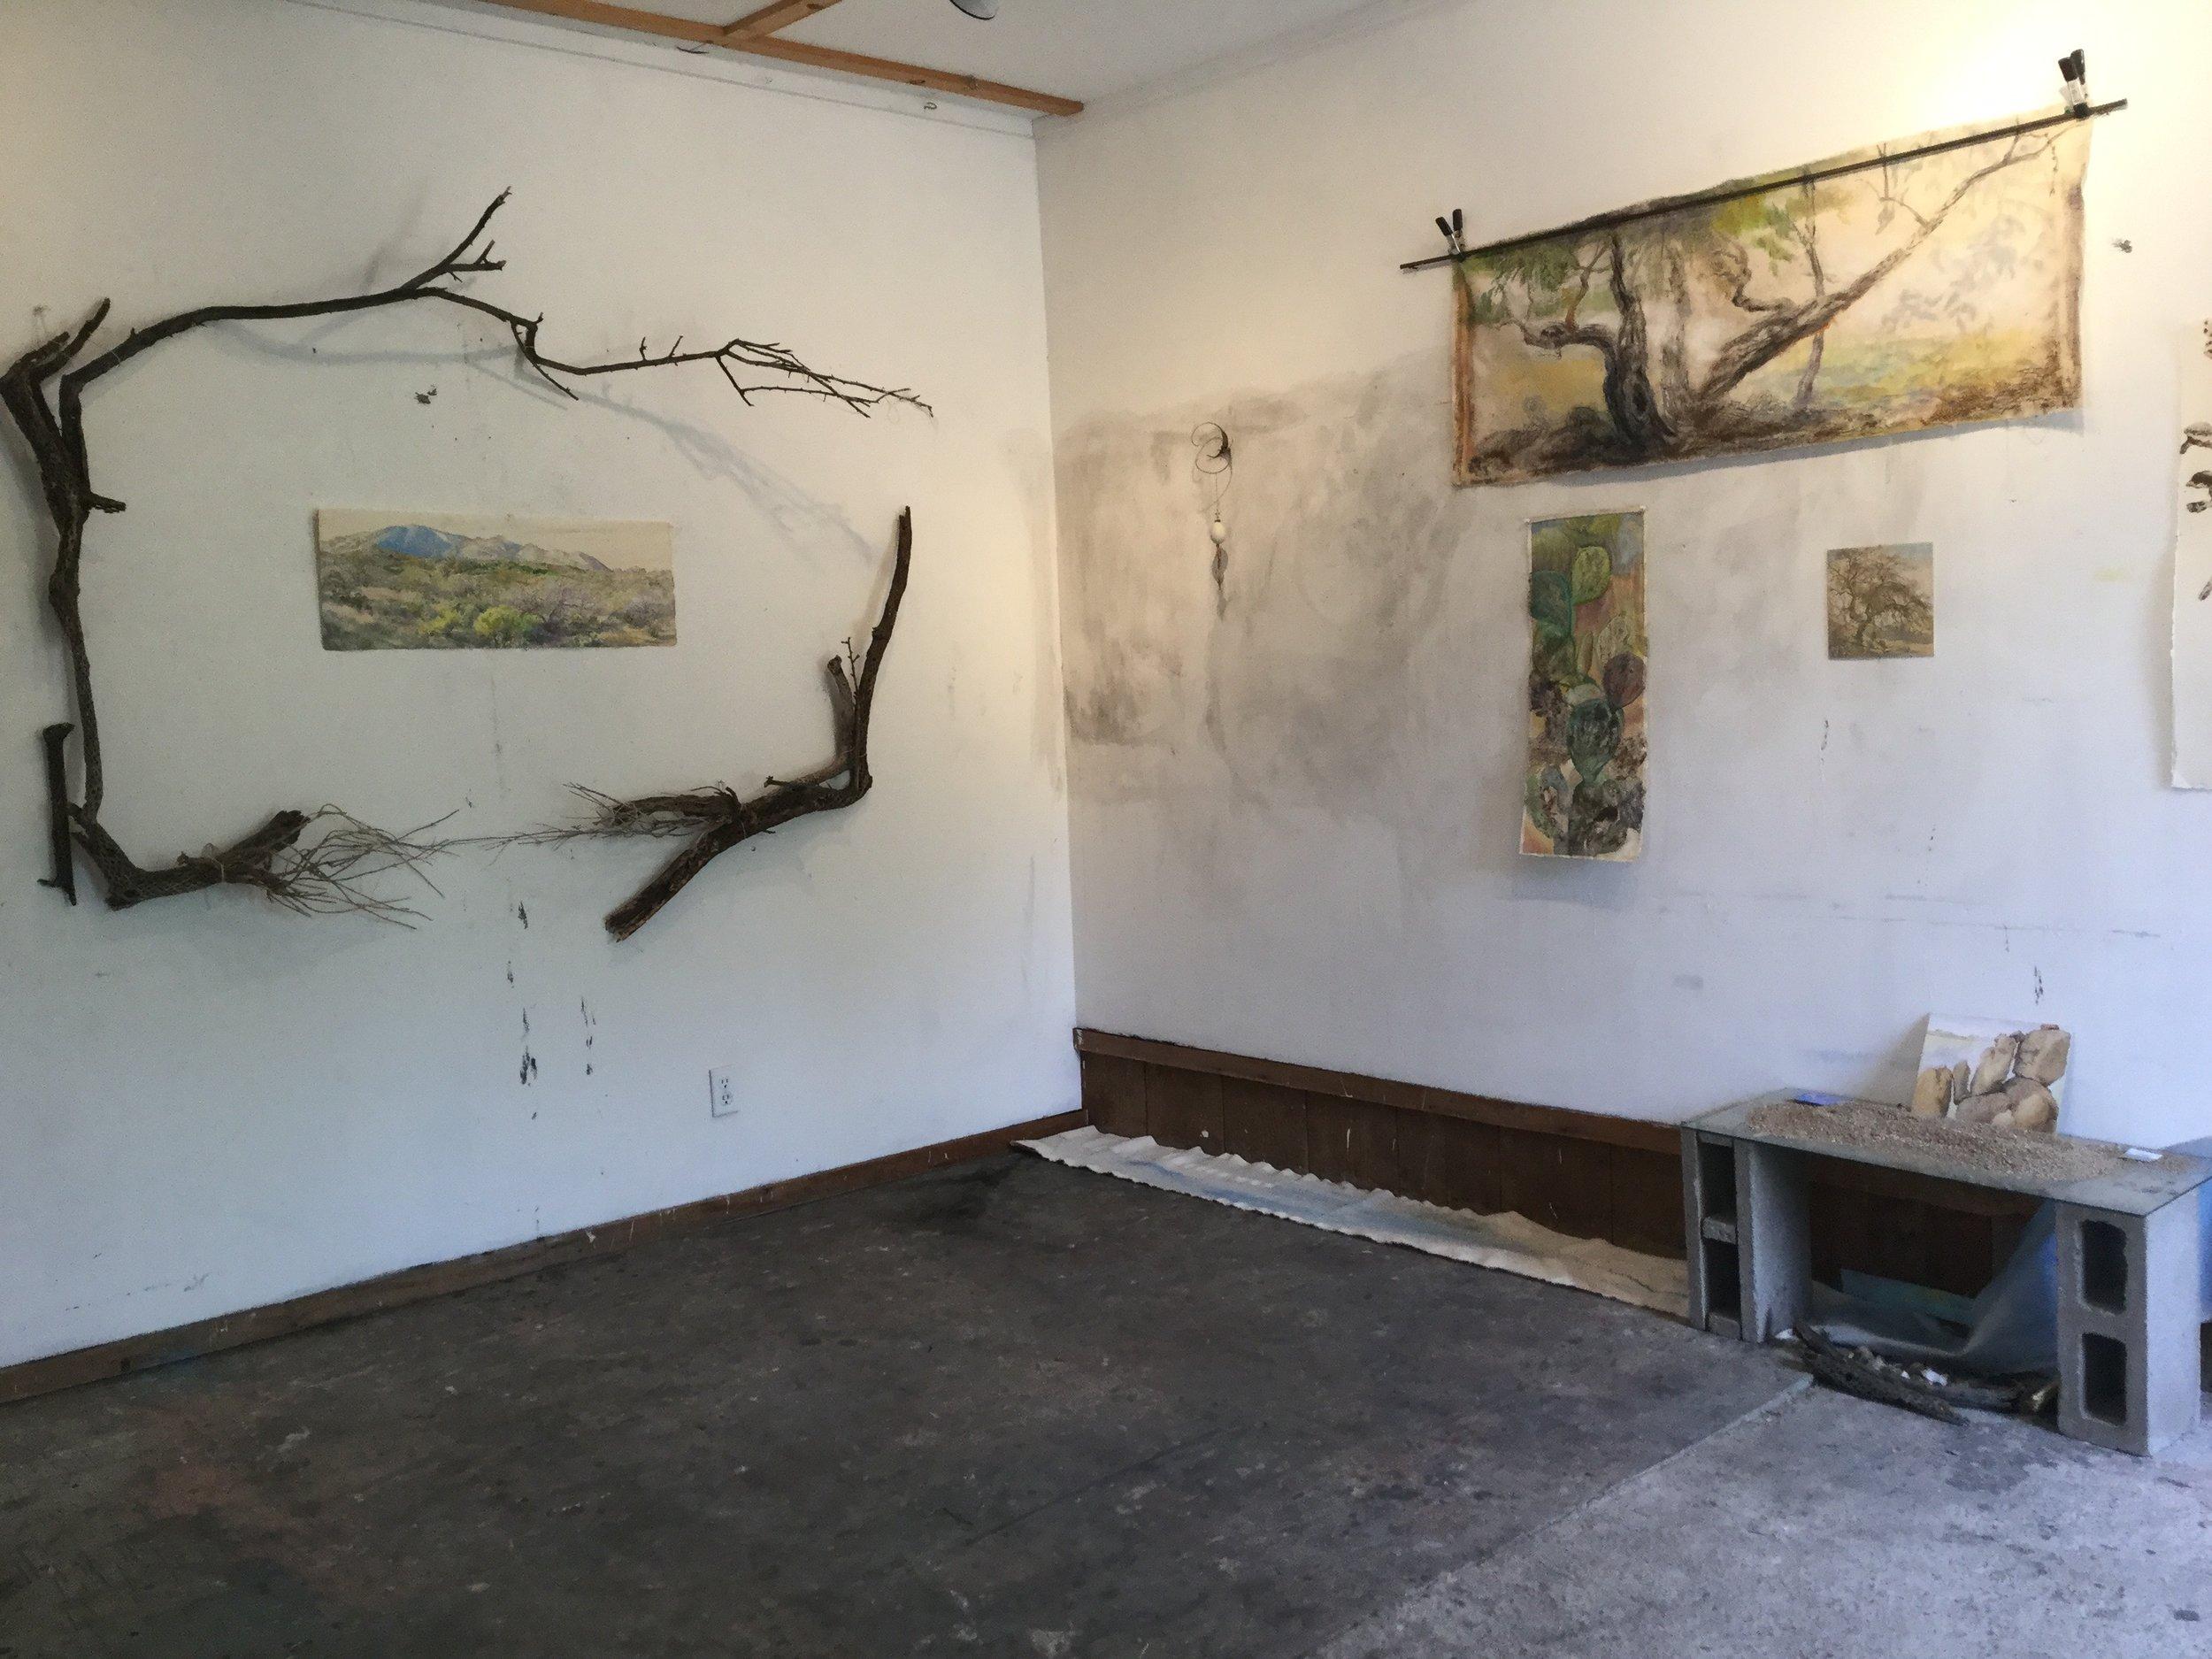 Hirn's studio at Rancho Lindo Vista